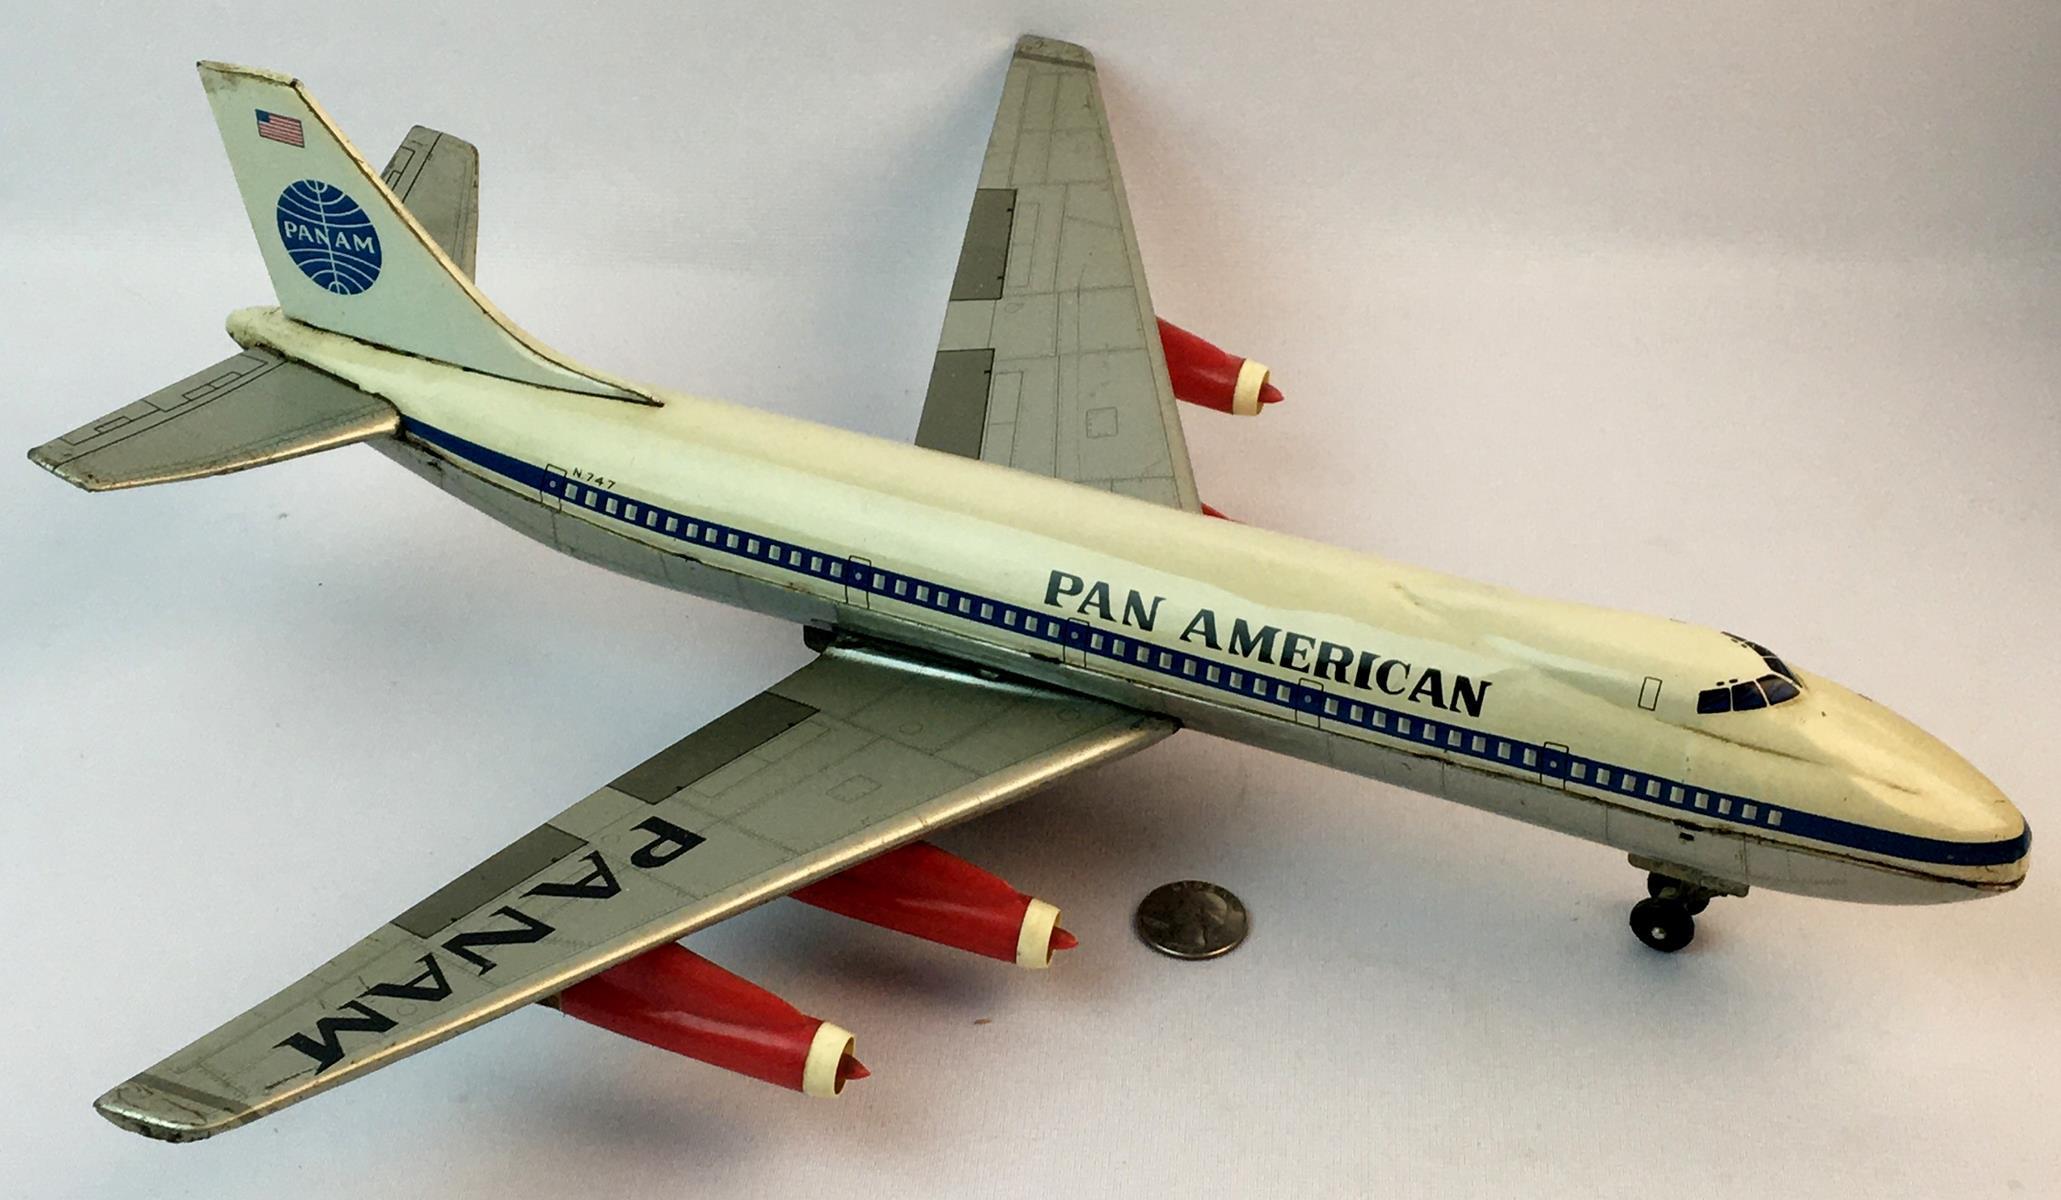 Vintage c. 1960 Alps Japan Pan American Tin Friction Toy N.747 Airplane